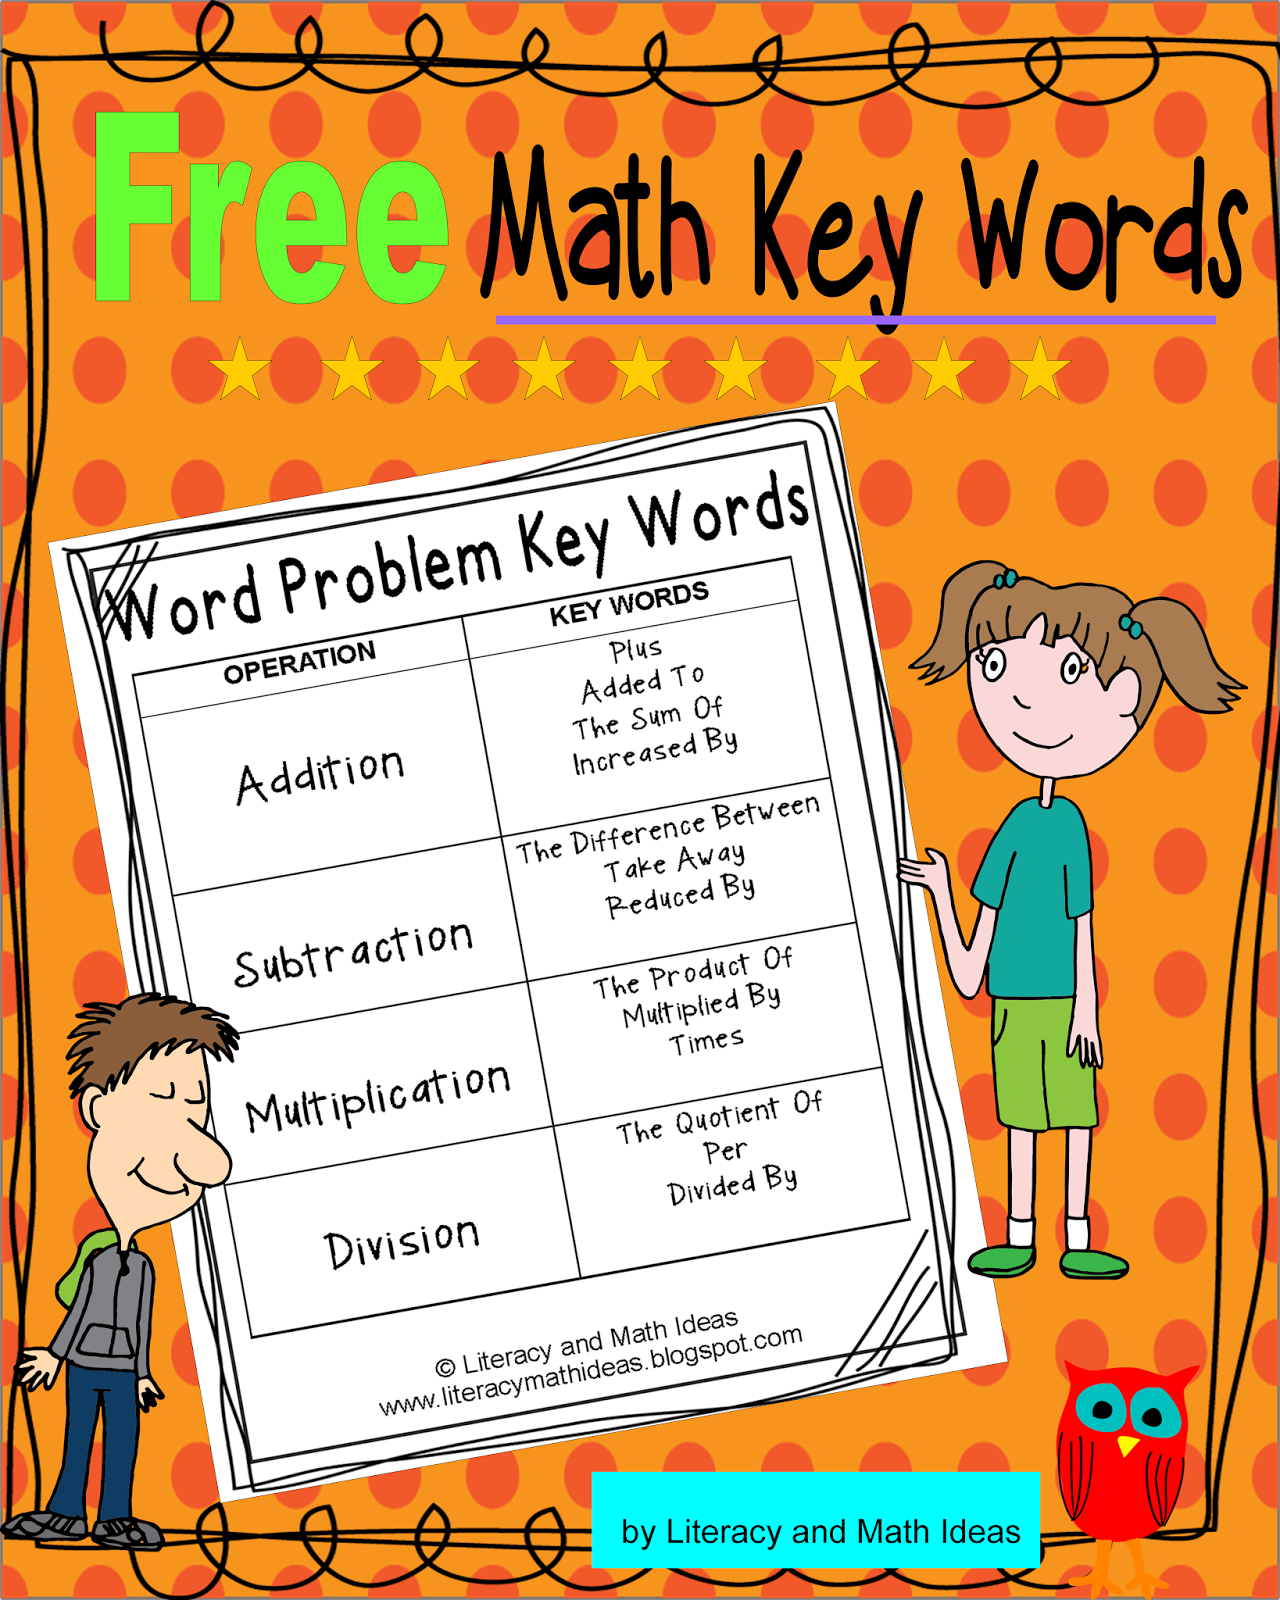 Literacy & Math Ideas: Math Operation Key Words